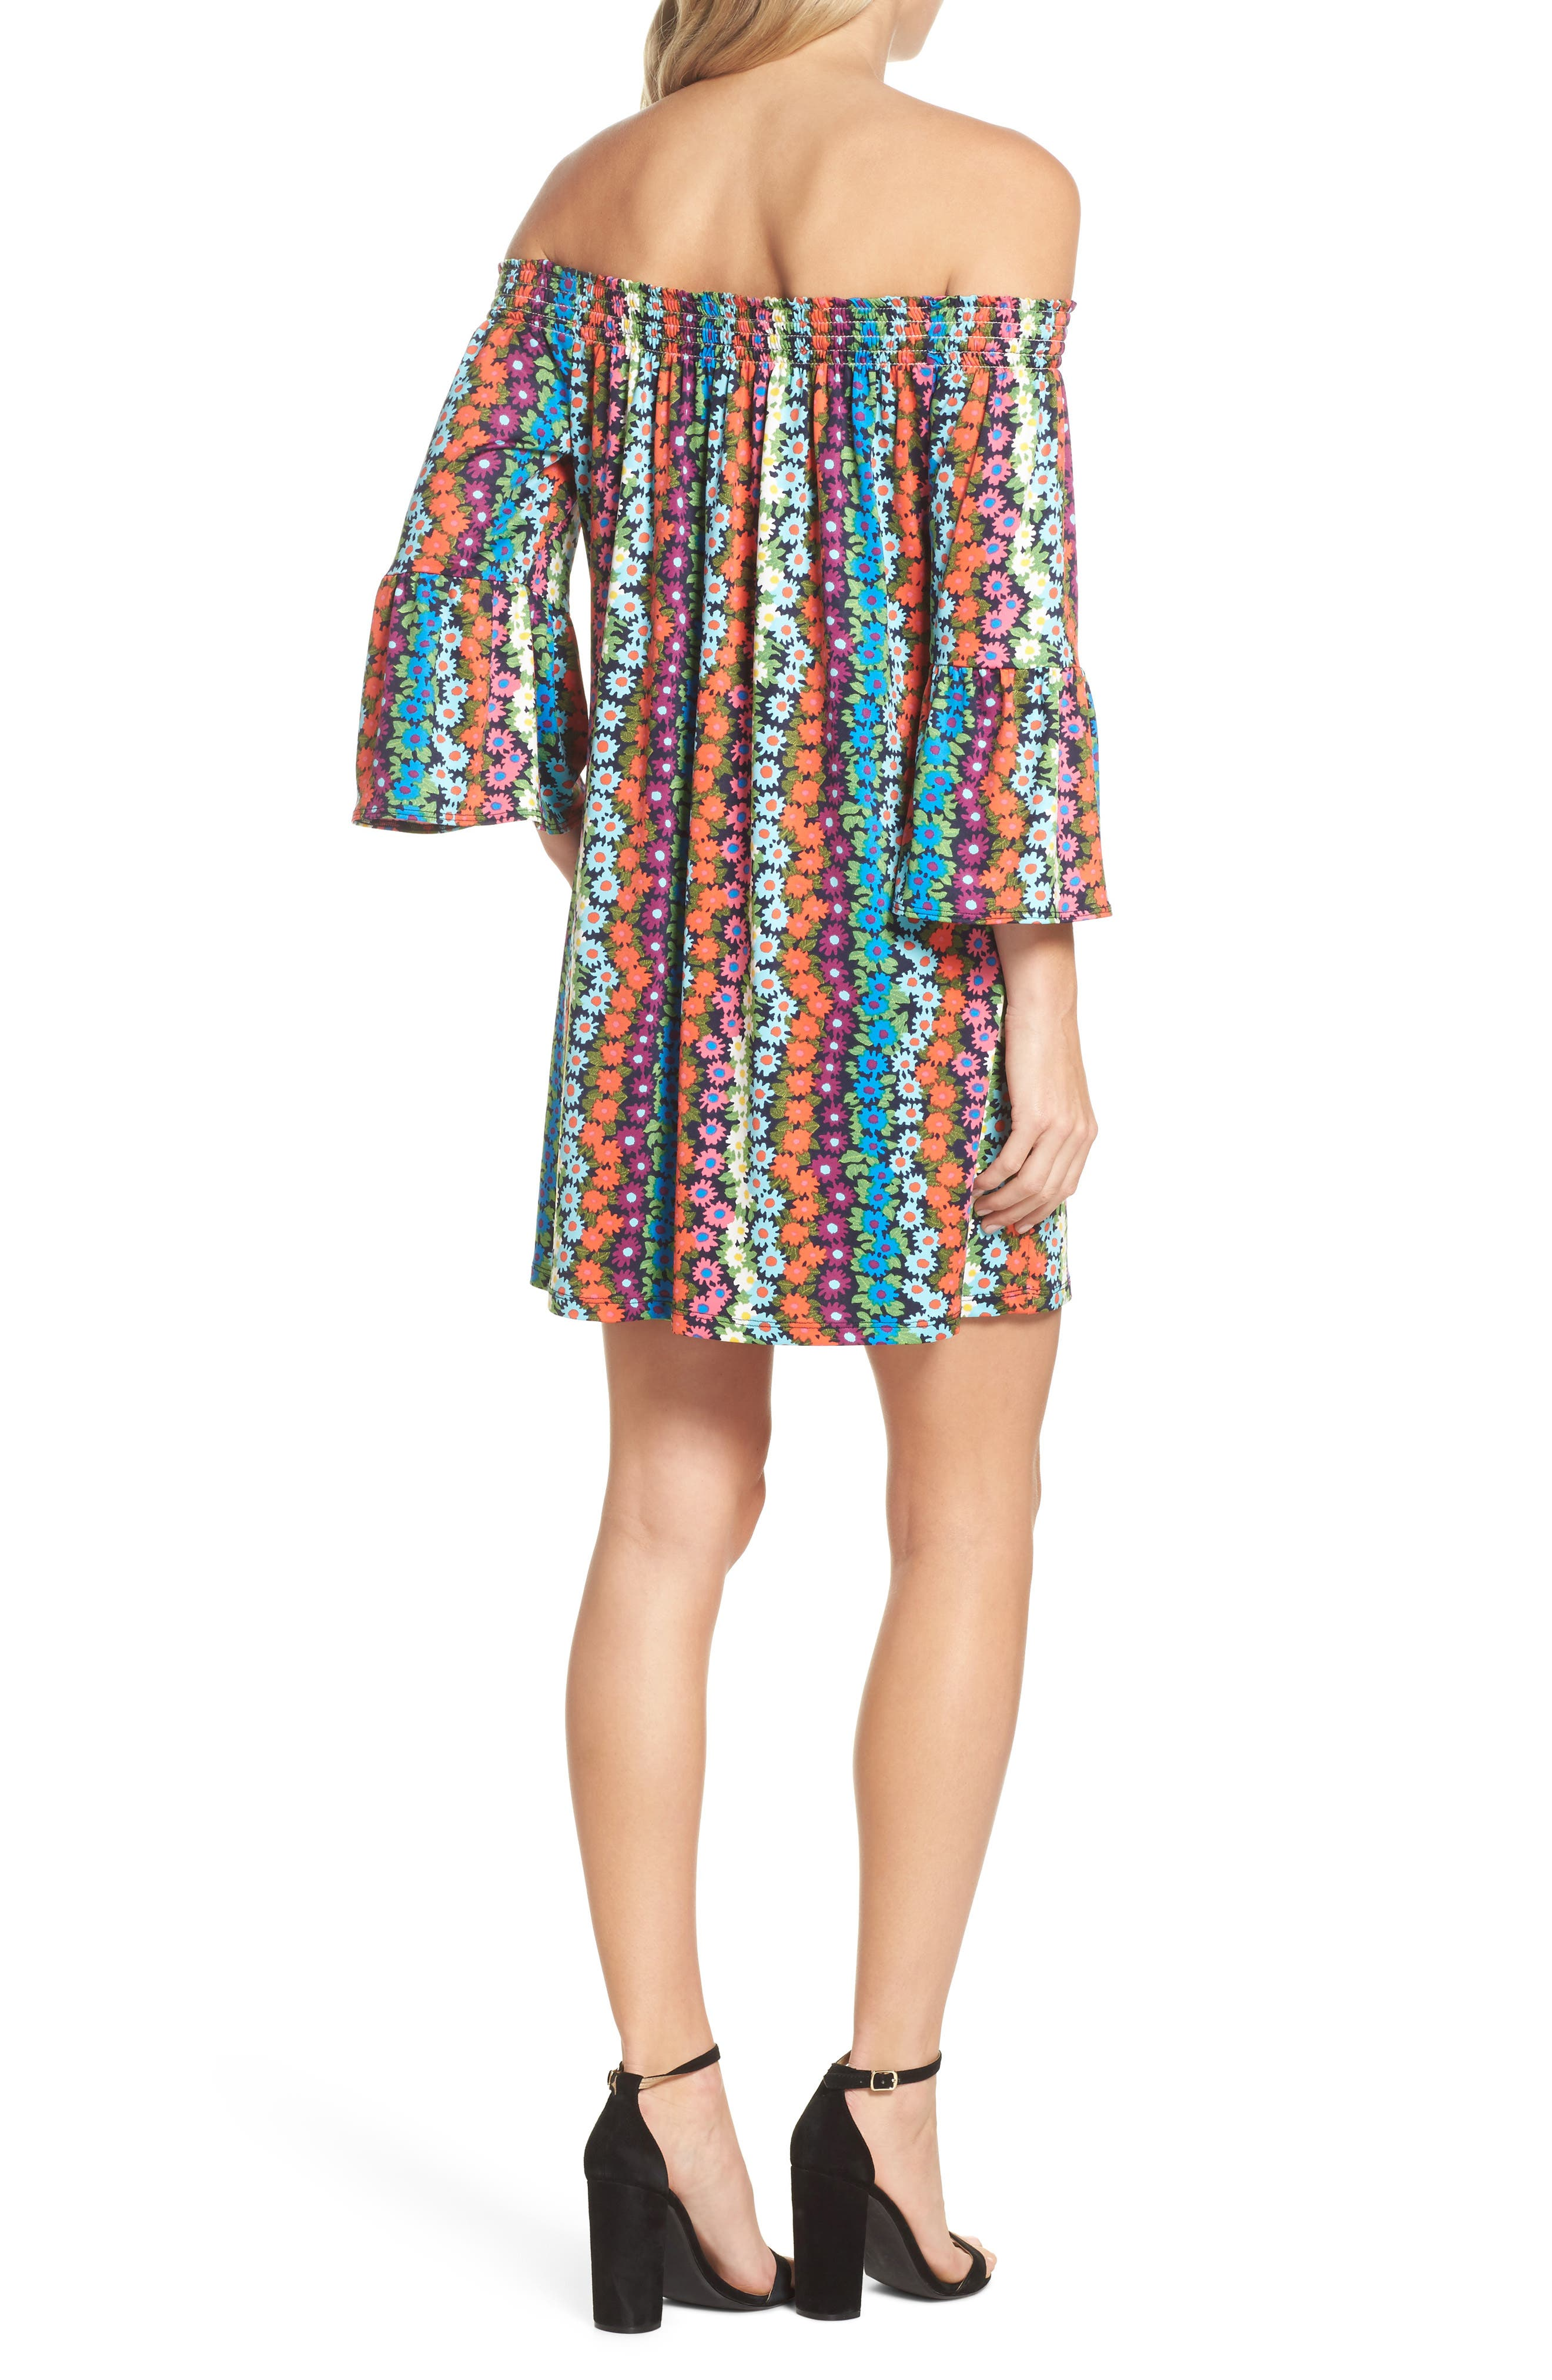 Trina Turk Off the Shoulder Bell Sleeve Dress,                             Alternate thumbnail 2, color,                             460